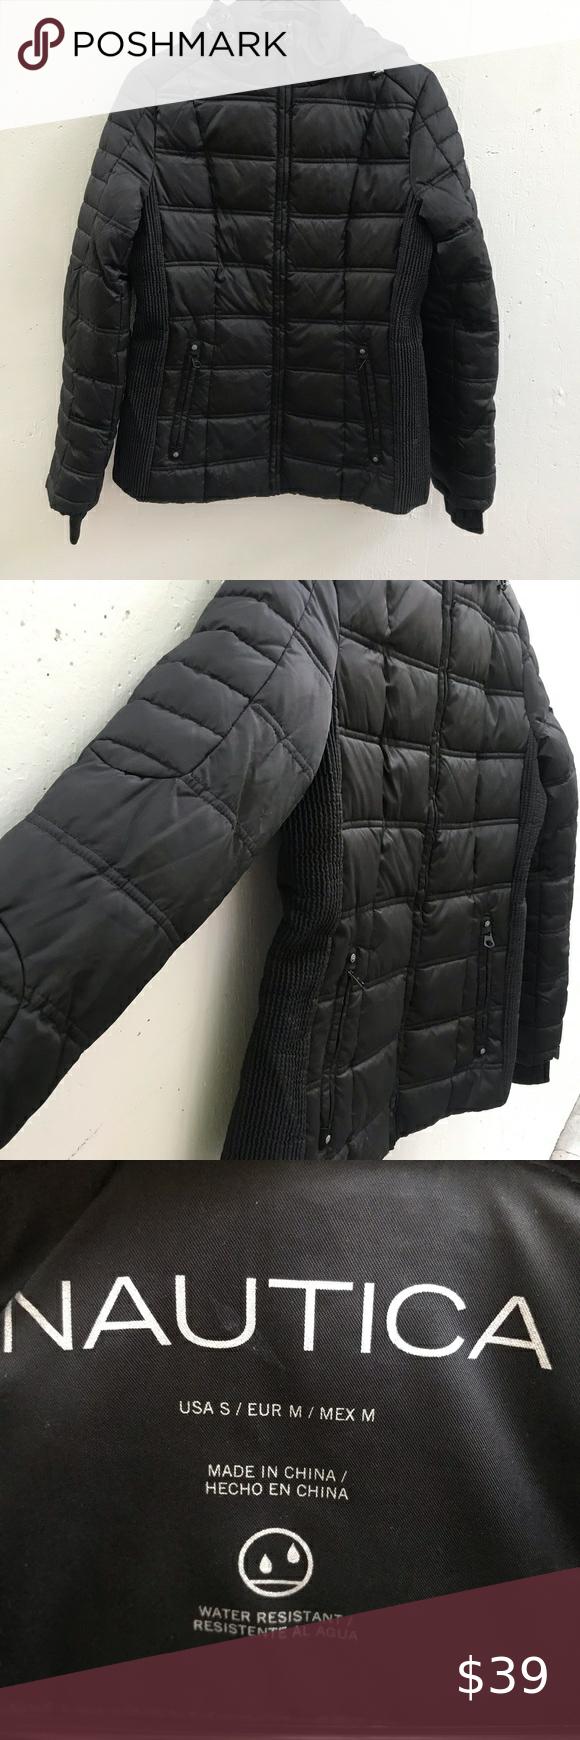 Nwot Nautica Puffer Jacket In Black Puffer Jackets Puffer Jackets [ 1740 x 580 Pixel ]